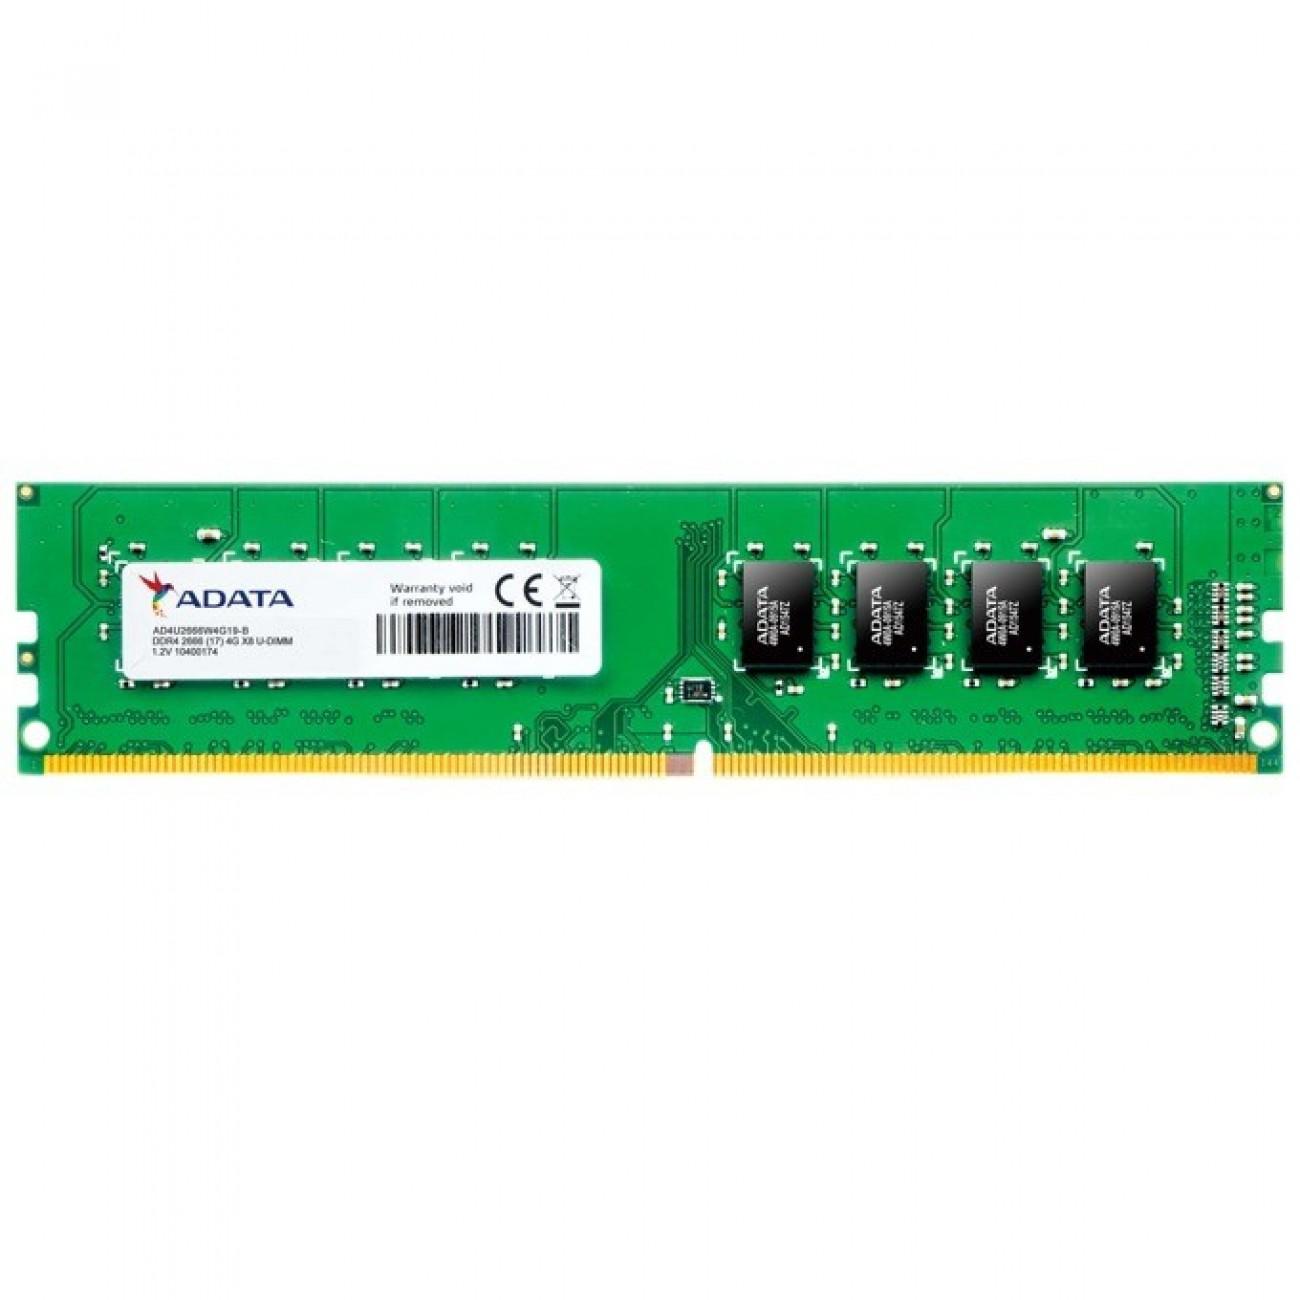 8GB DDR4 2666MHz, UDIMM, A-Data AD4U266638G19-B, 1.2V в Настолни компютри Памети -    Alleop